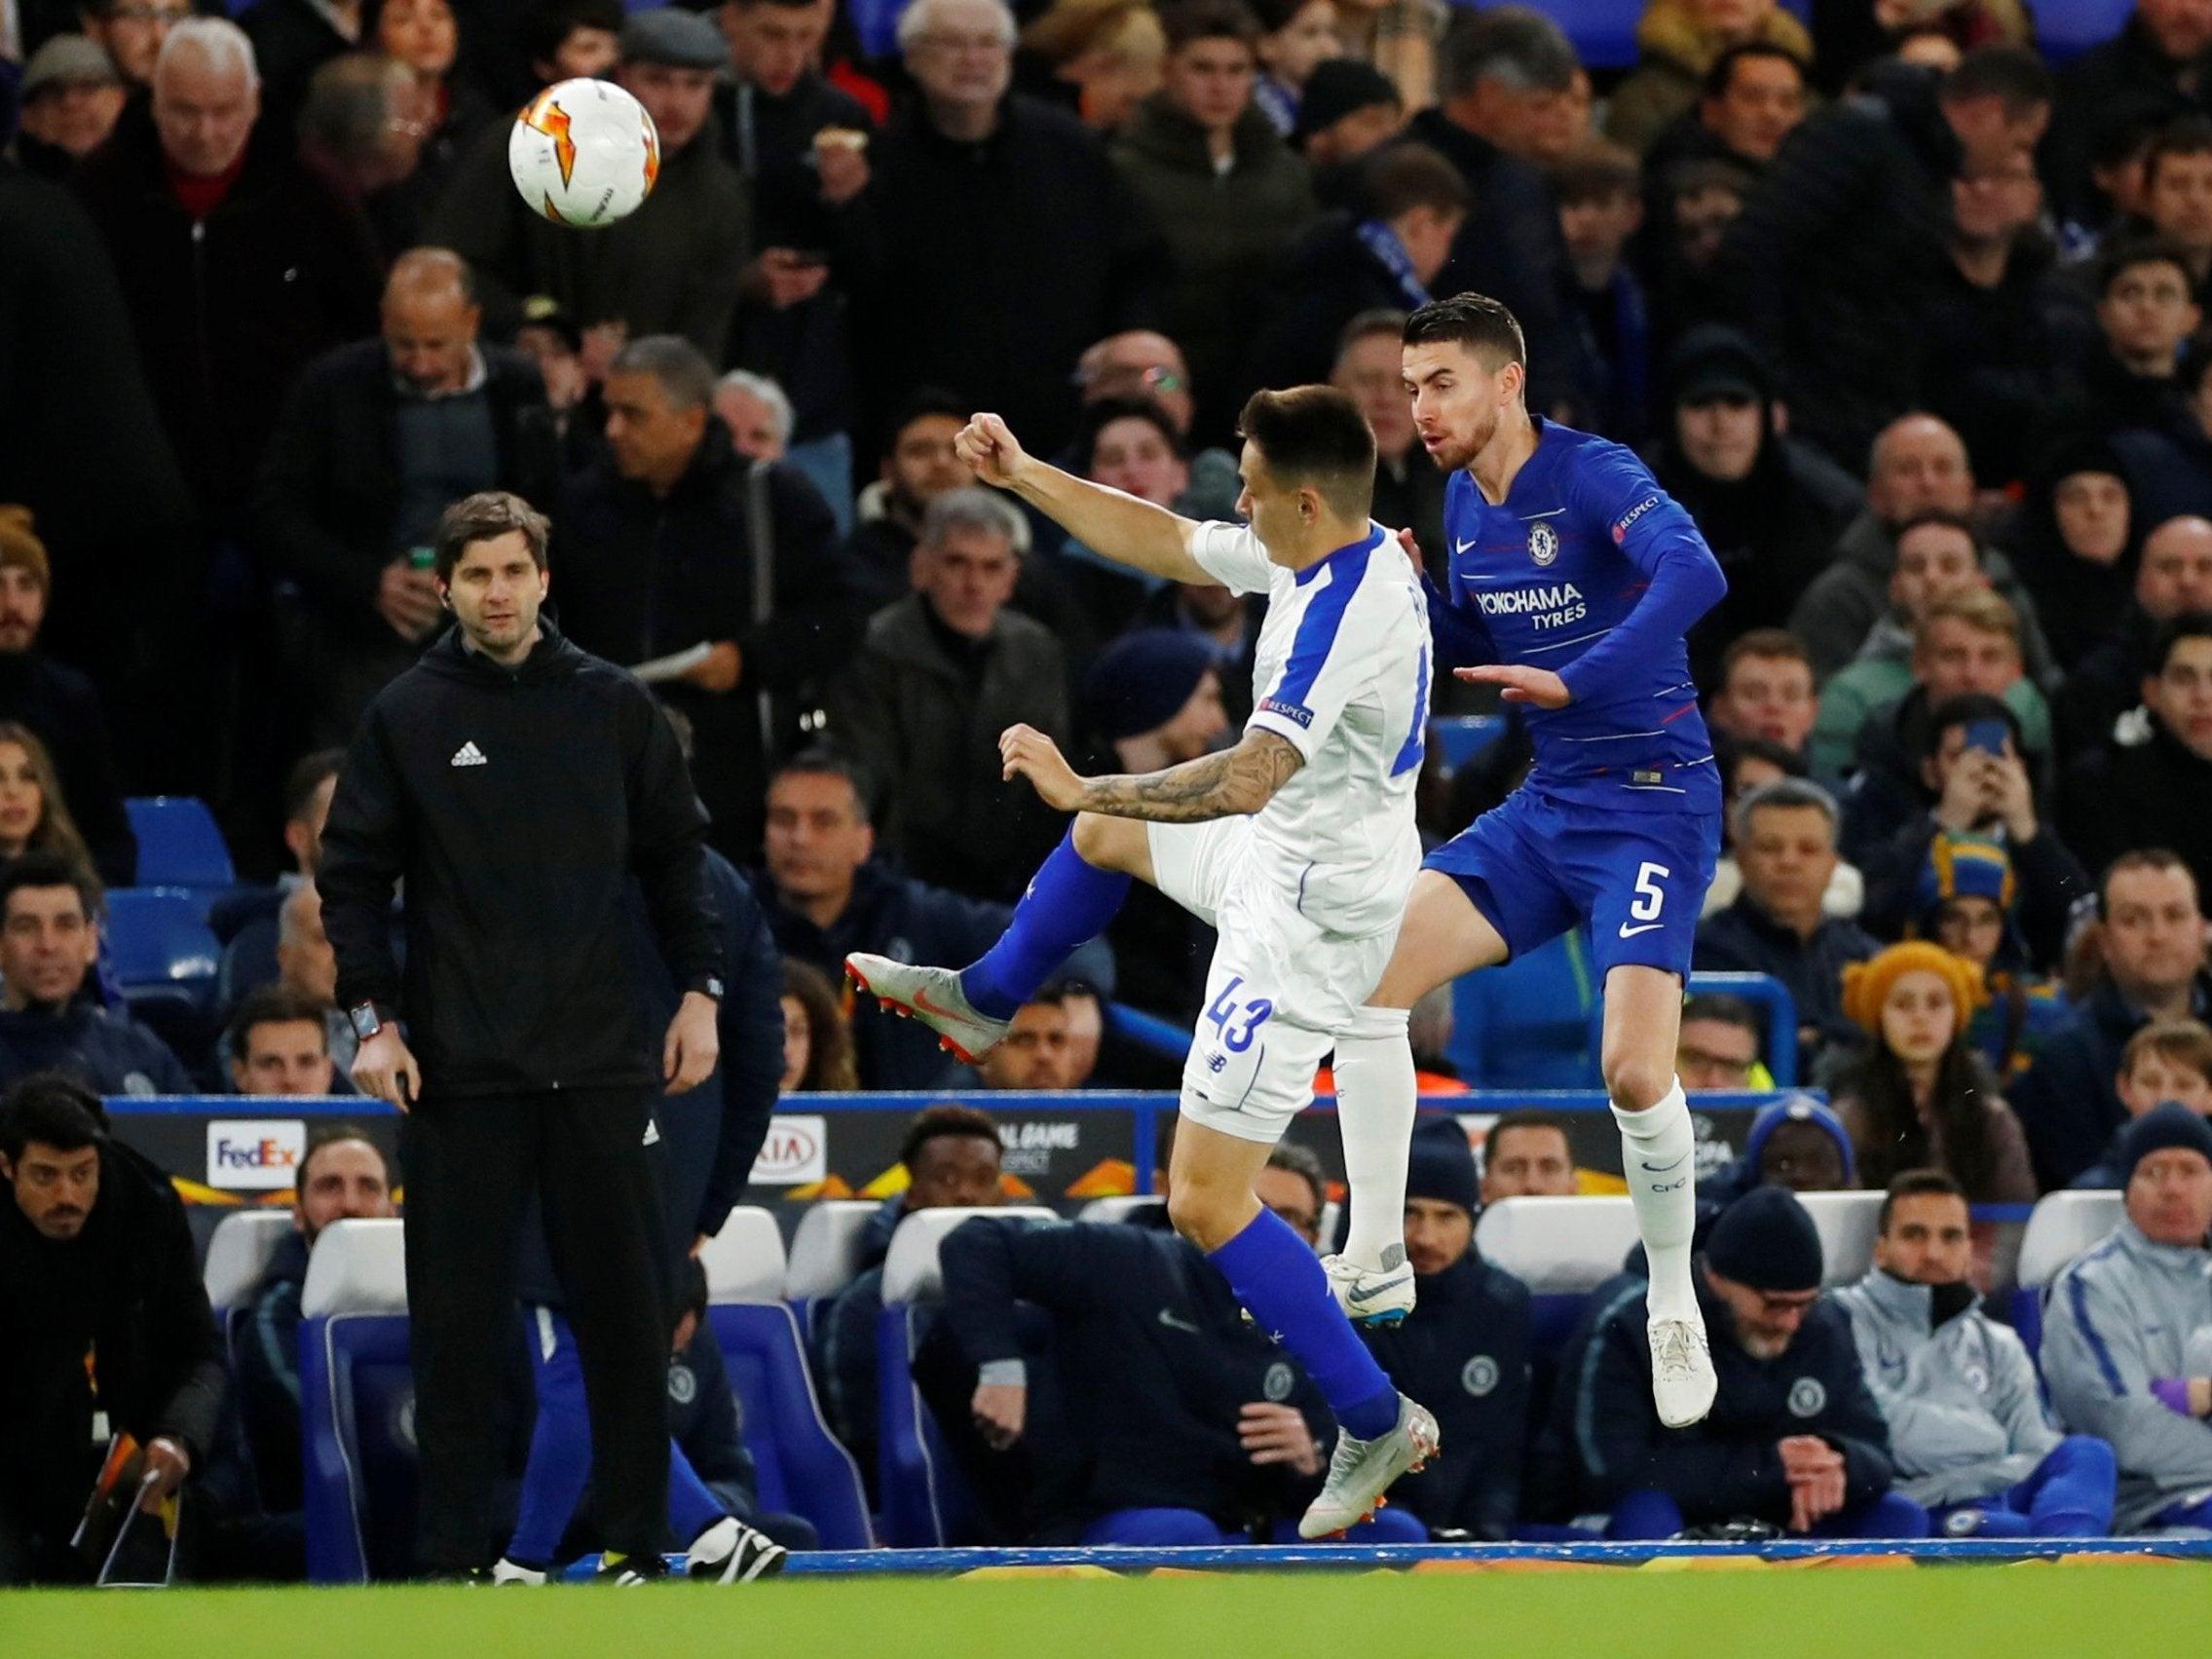 Dynamo Kyjev – Chelsea Facebook: Chelsea Coast Past Dymano Kiev To Put One Foot In Europa